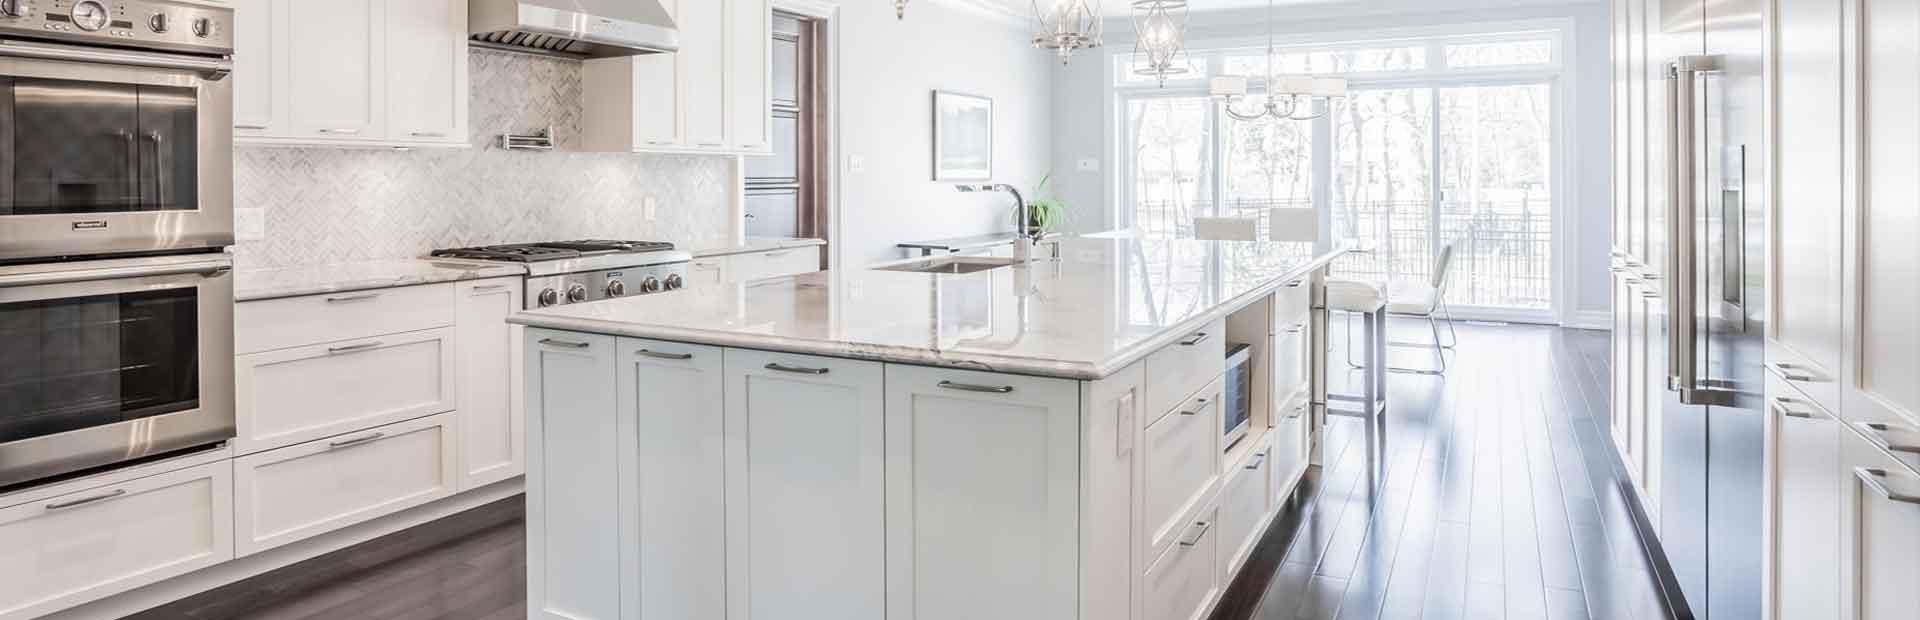 KITCHEN MART ® Designer Kitchens | Kitchen & Bathroom Renovations ...